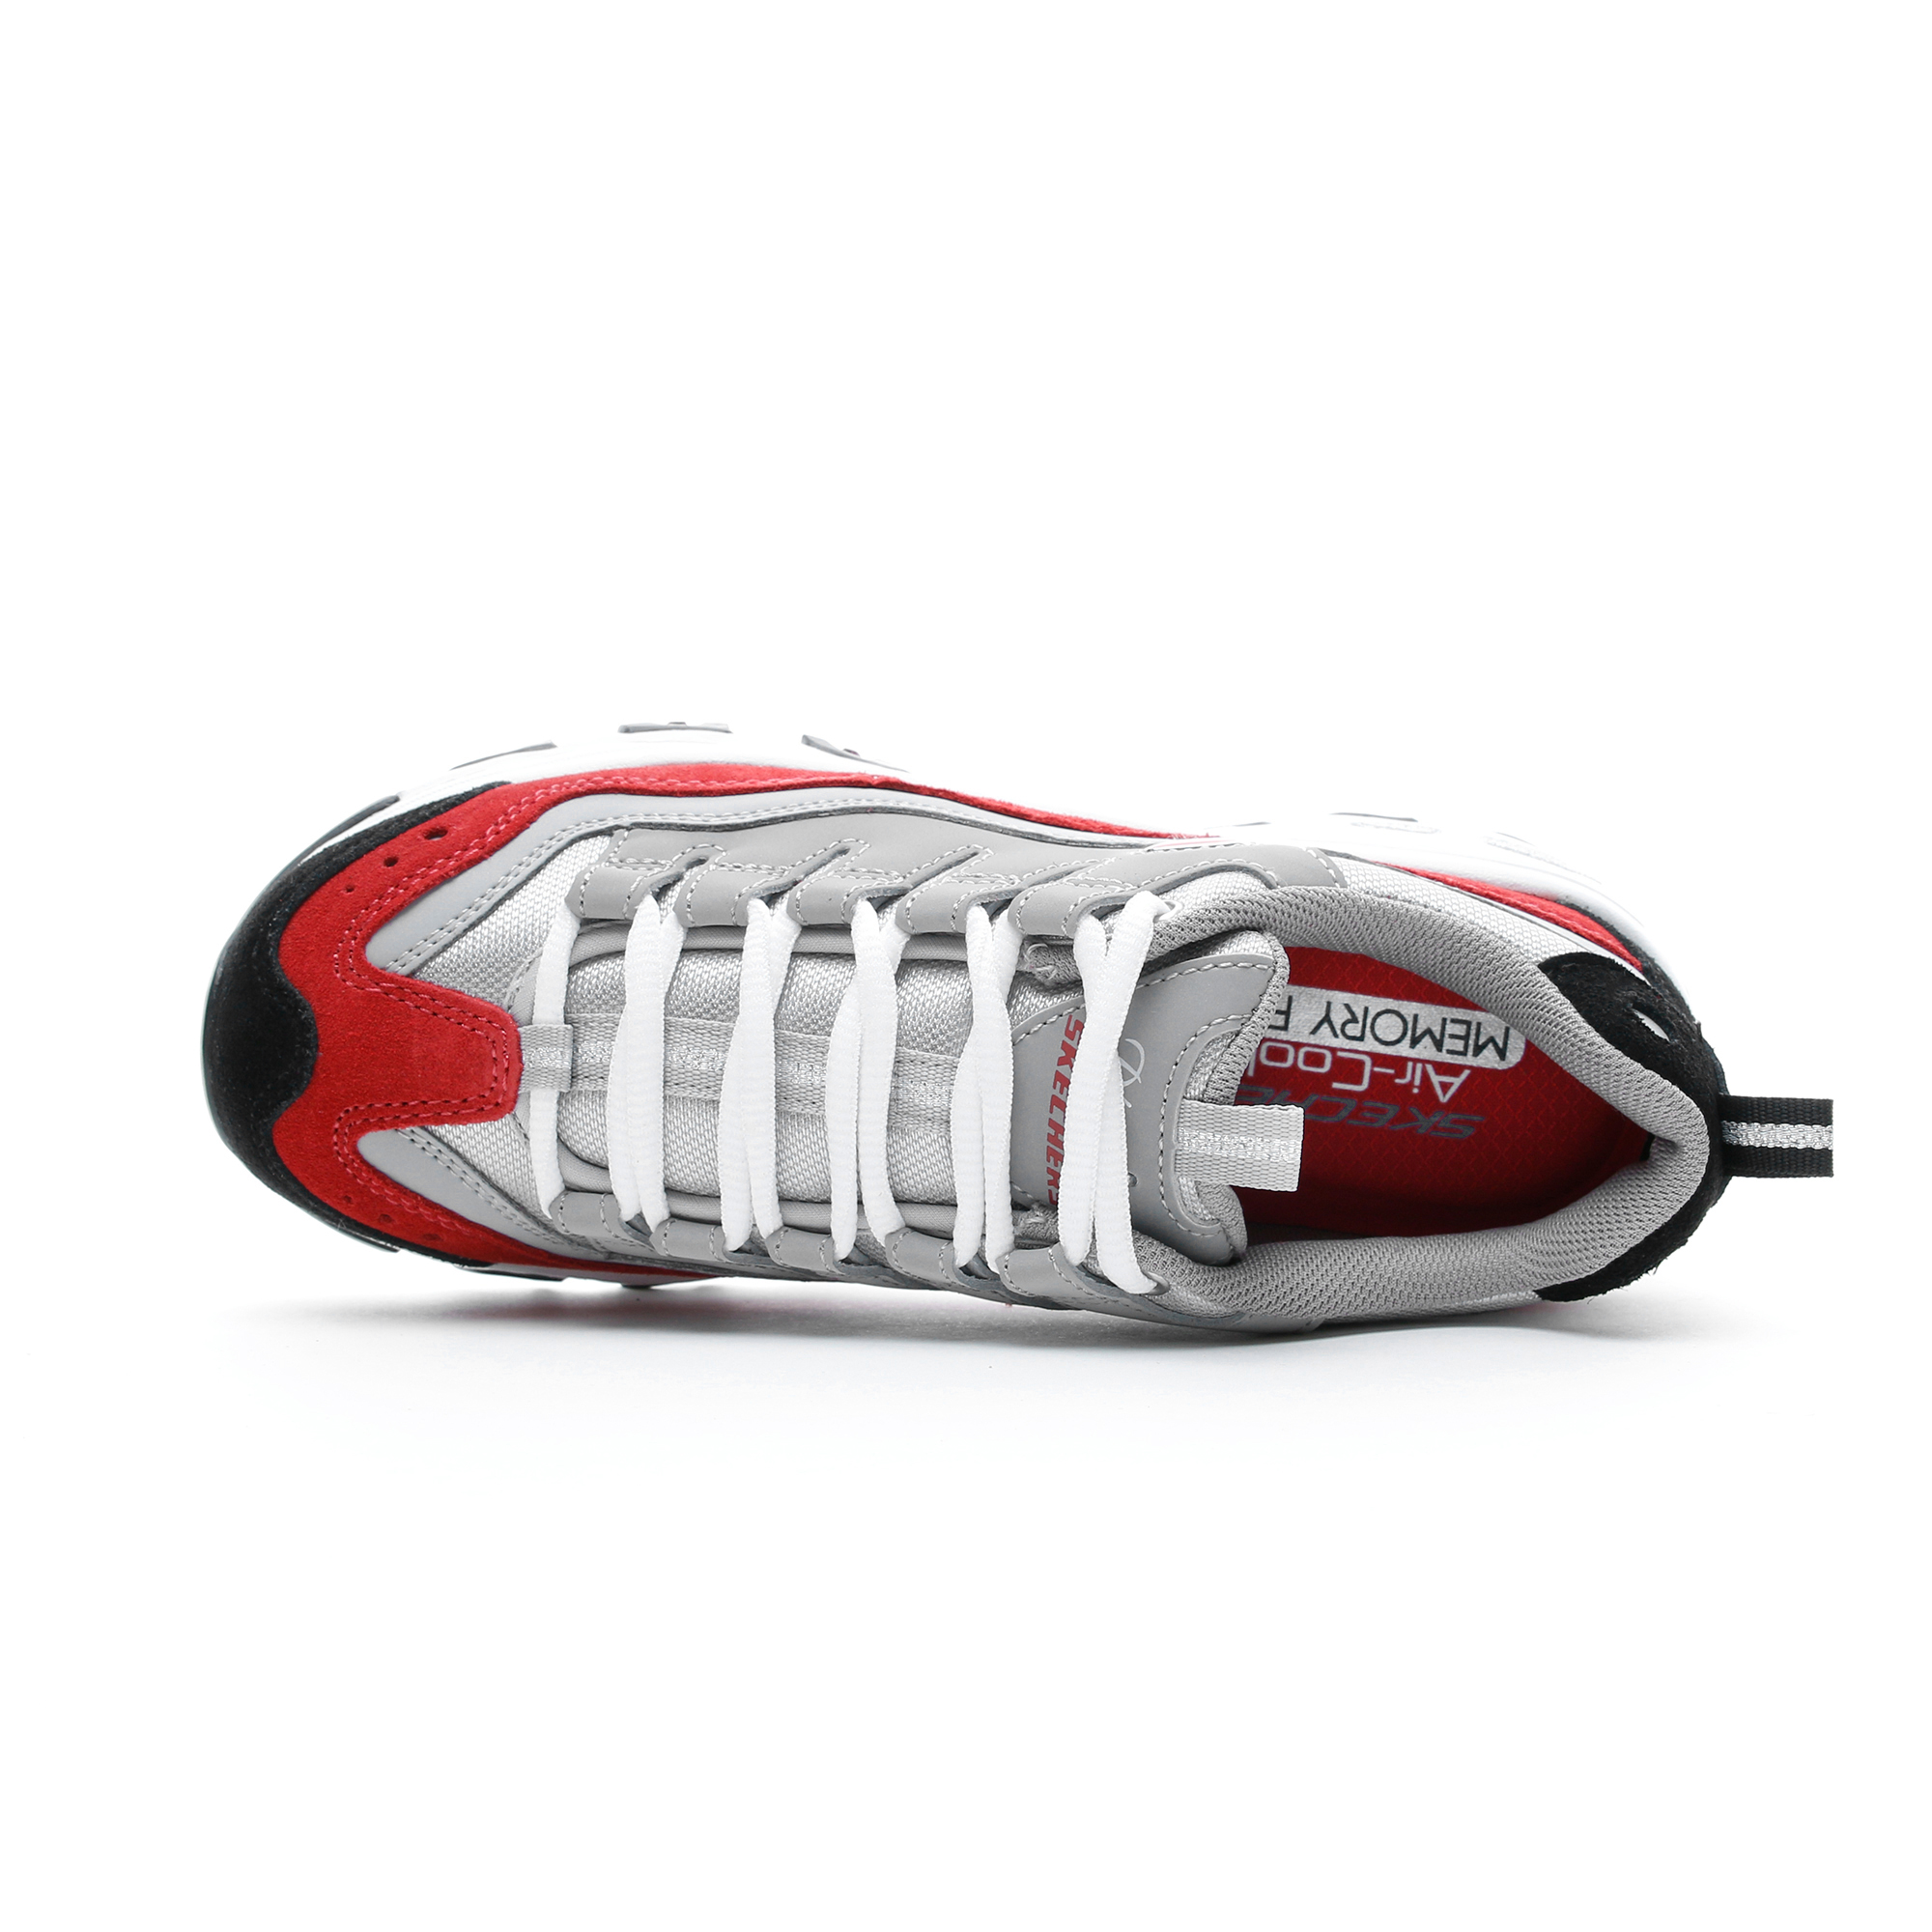 Skechers D'Lites-Sure Thing Gri Kadın Spor Ayakkabı